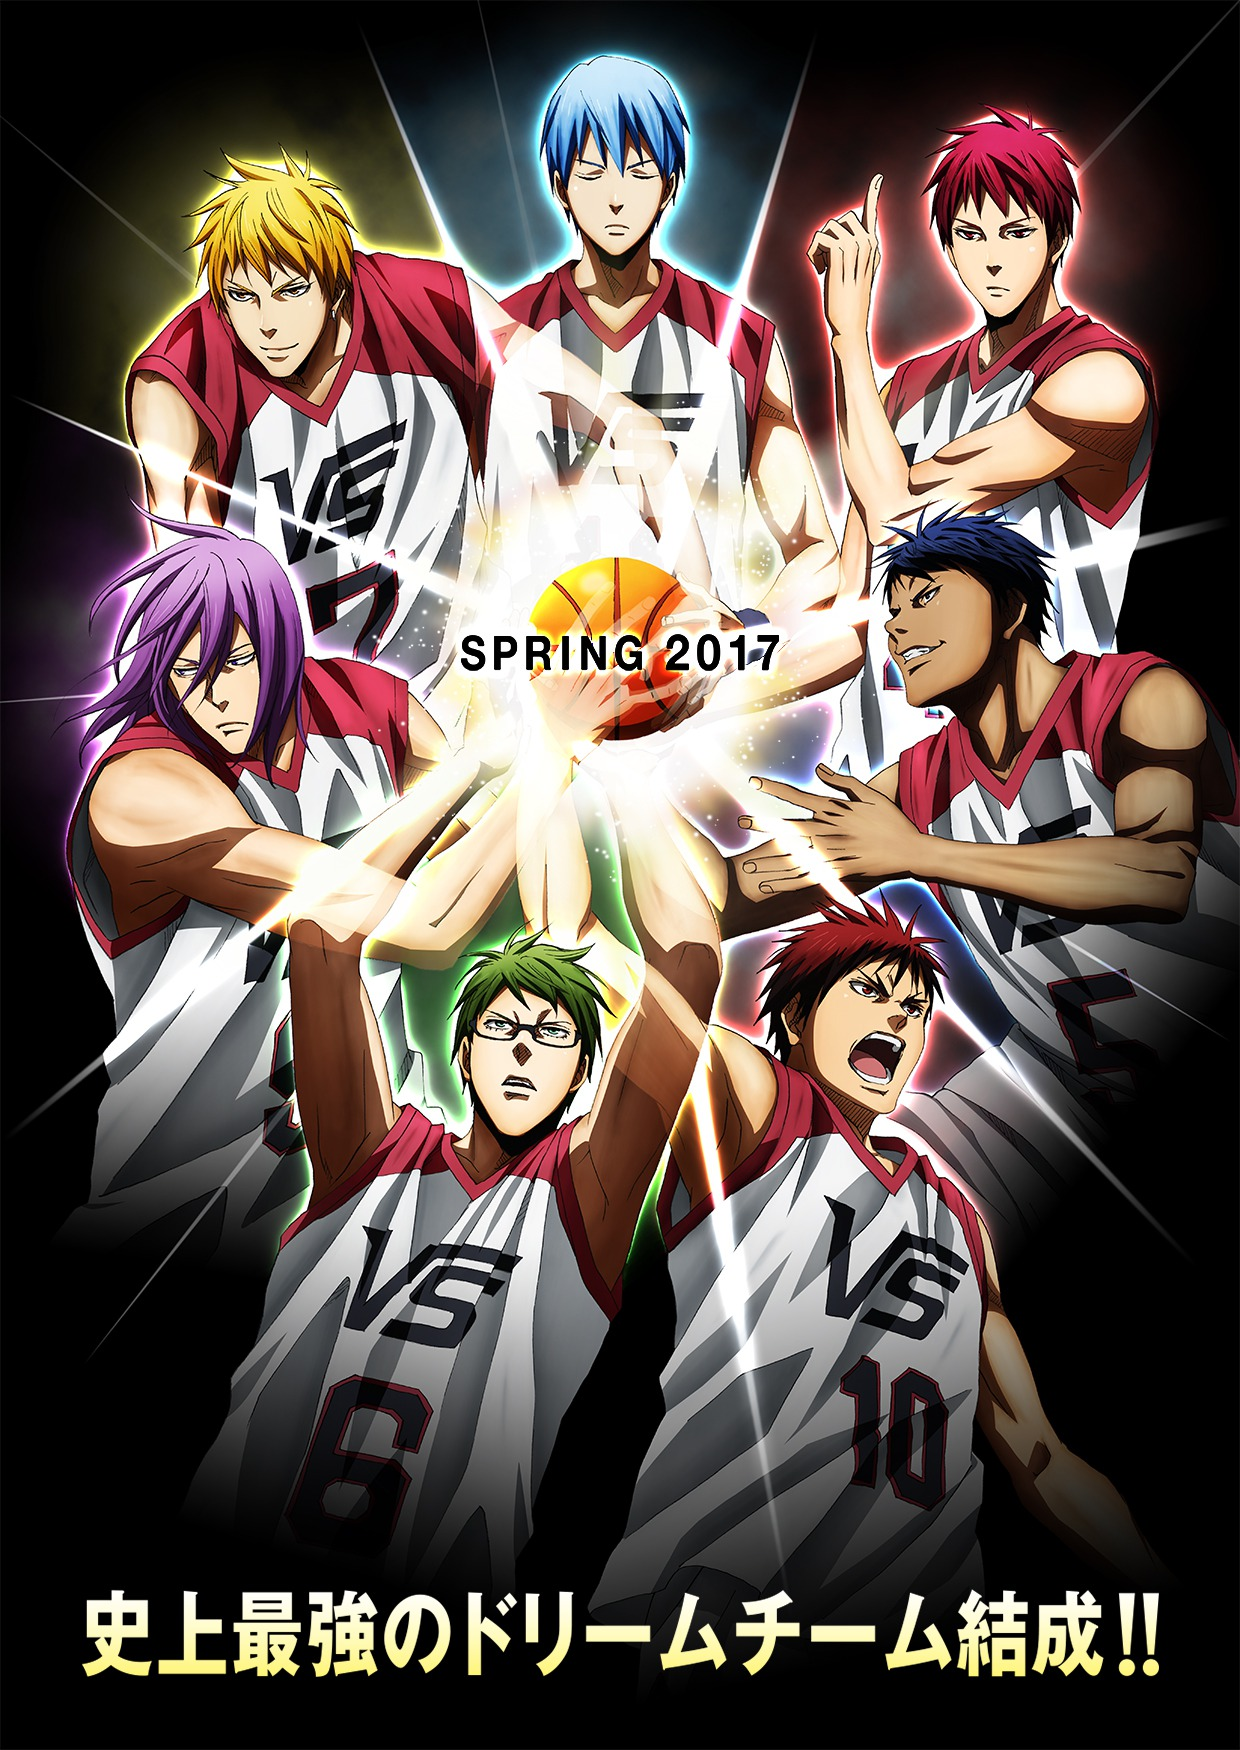 kuroko-no-basket-last-game-filme.jpg